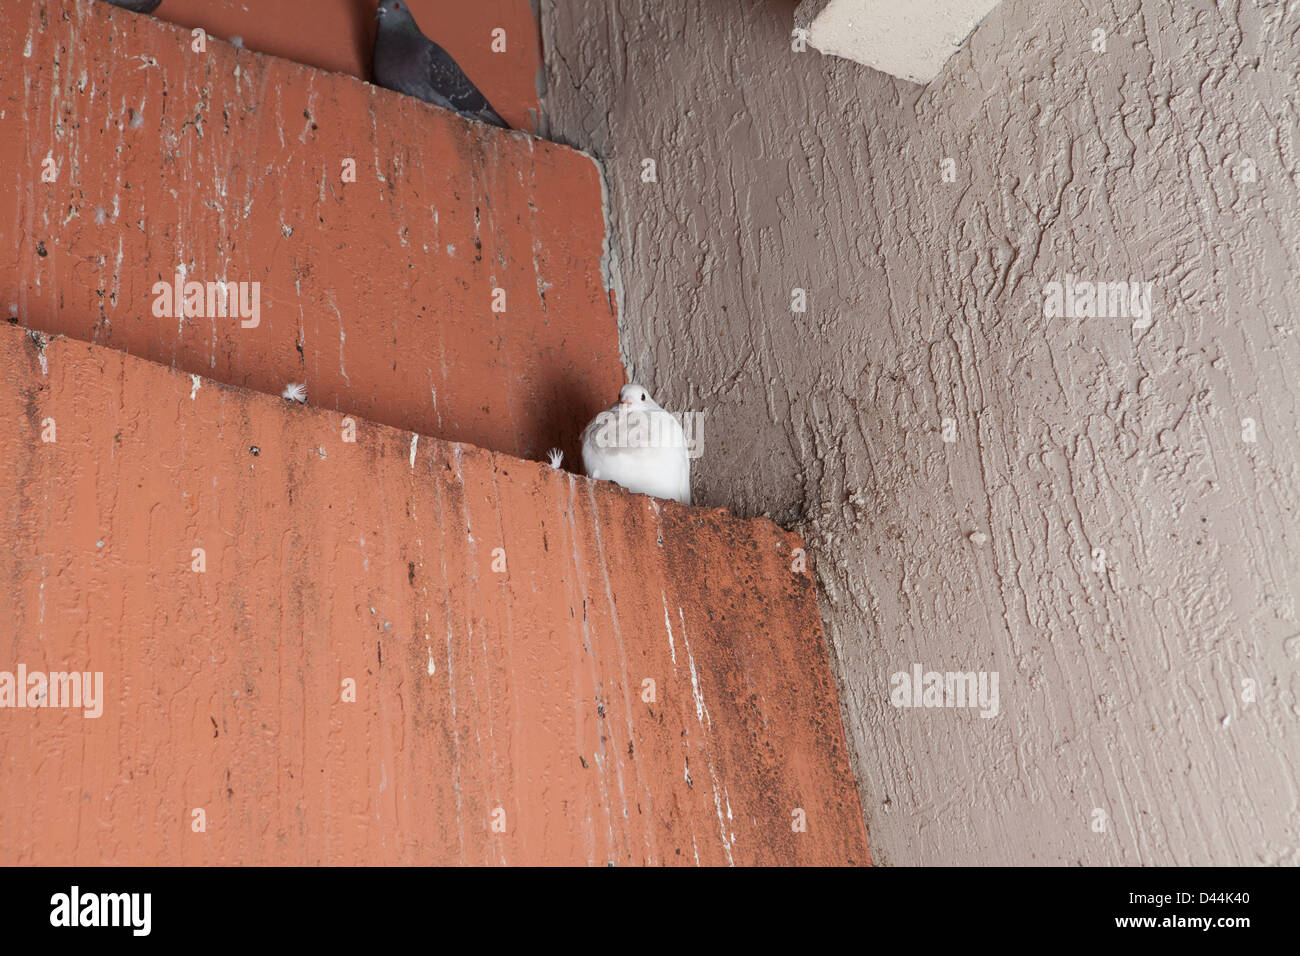 pigeon nest - Stock Image